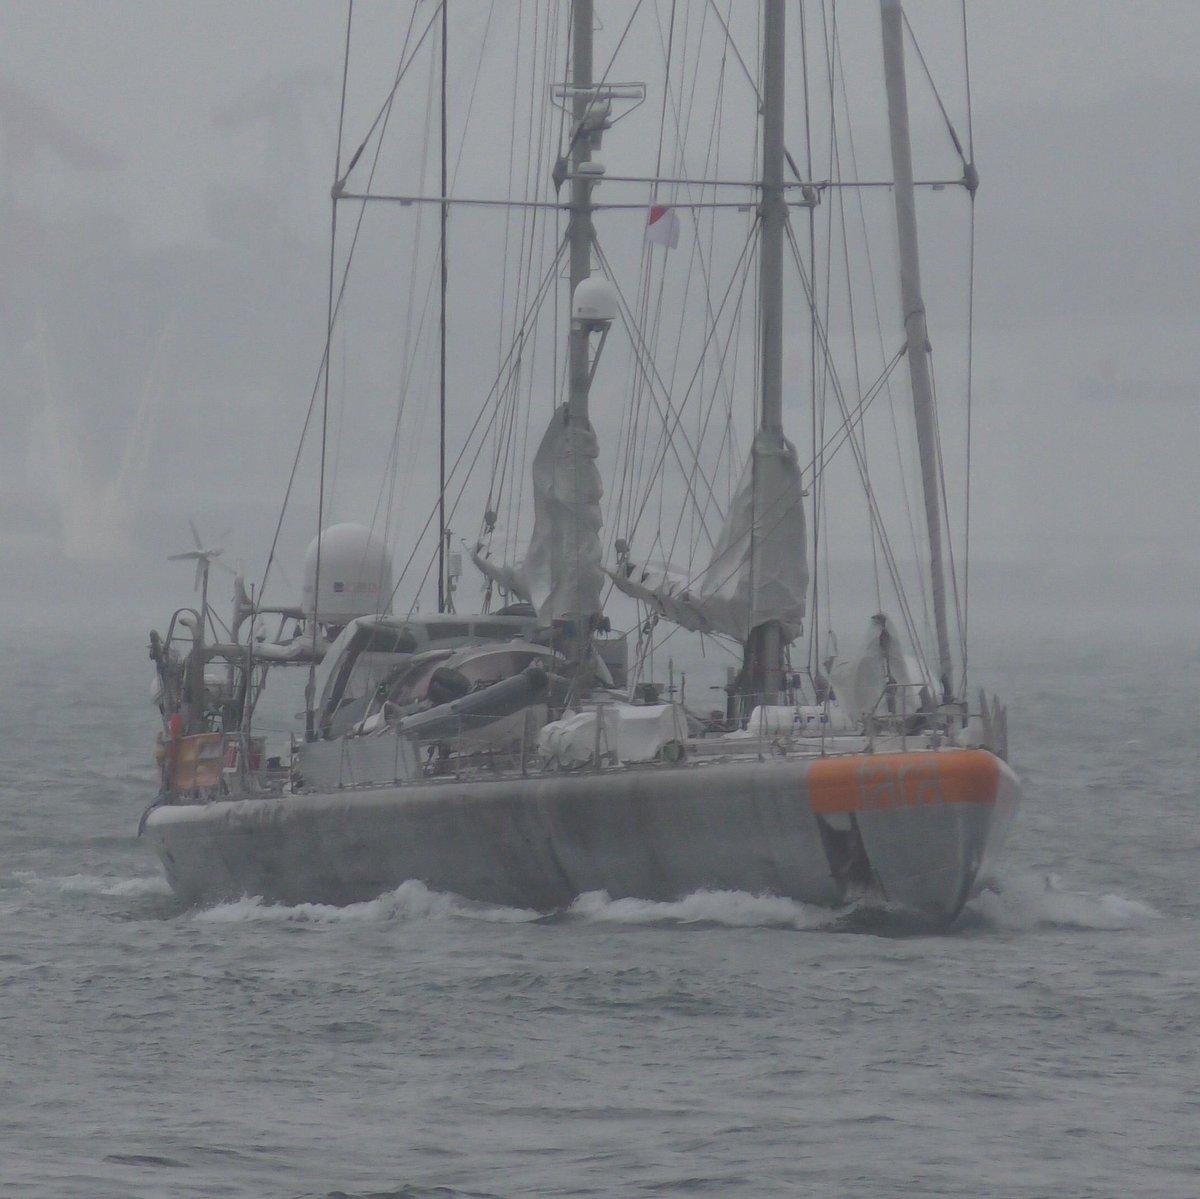 #climate #OceanSummit @binmei @TaraExpeditions Tara of #TaraPacific Bon voyage!<br>http://pic.twitter.com/cMoefwBVOq